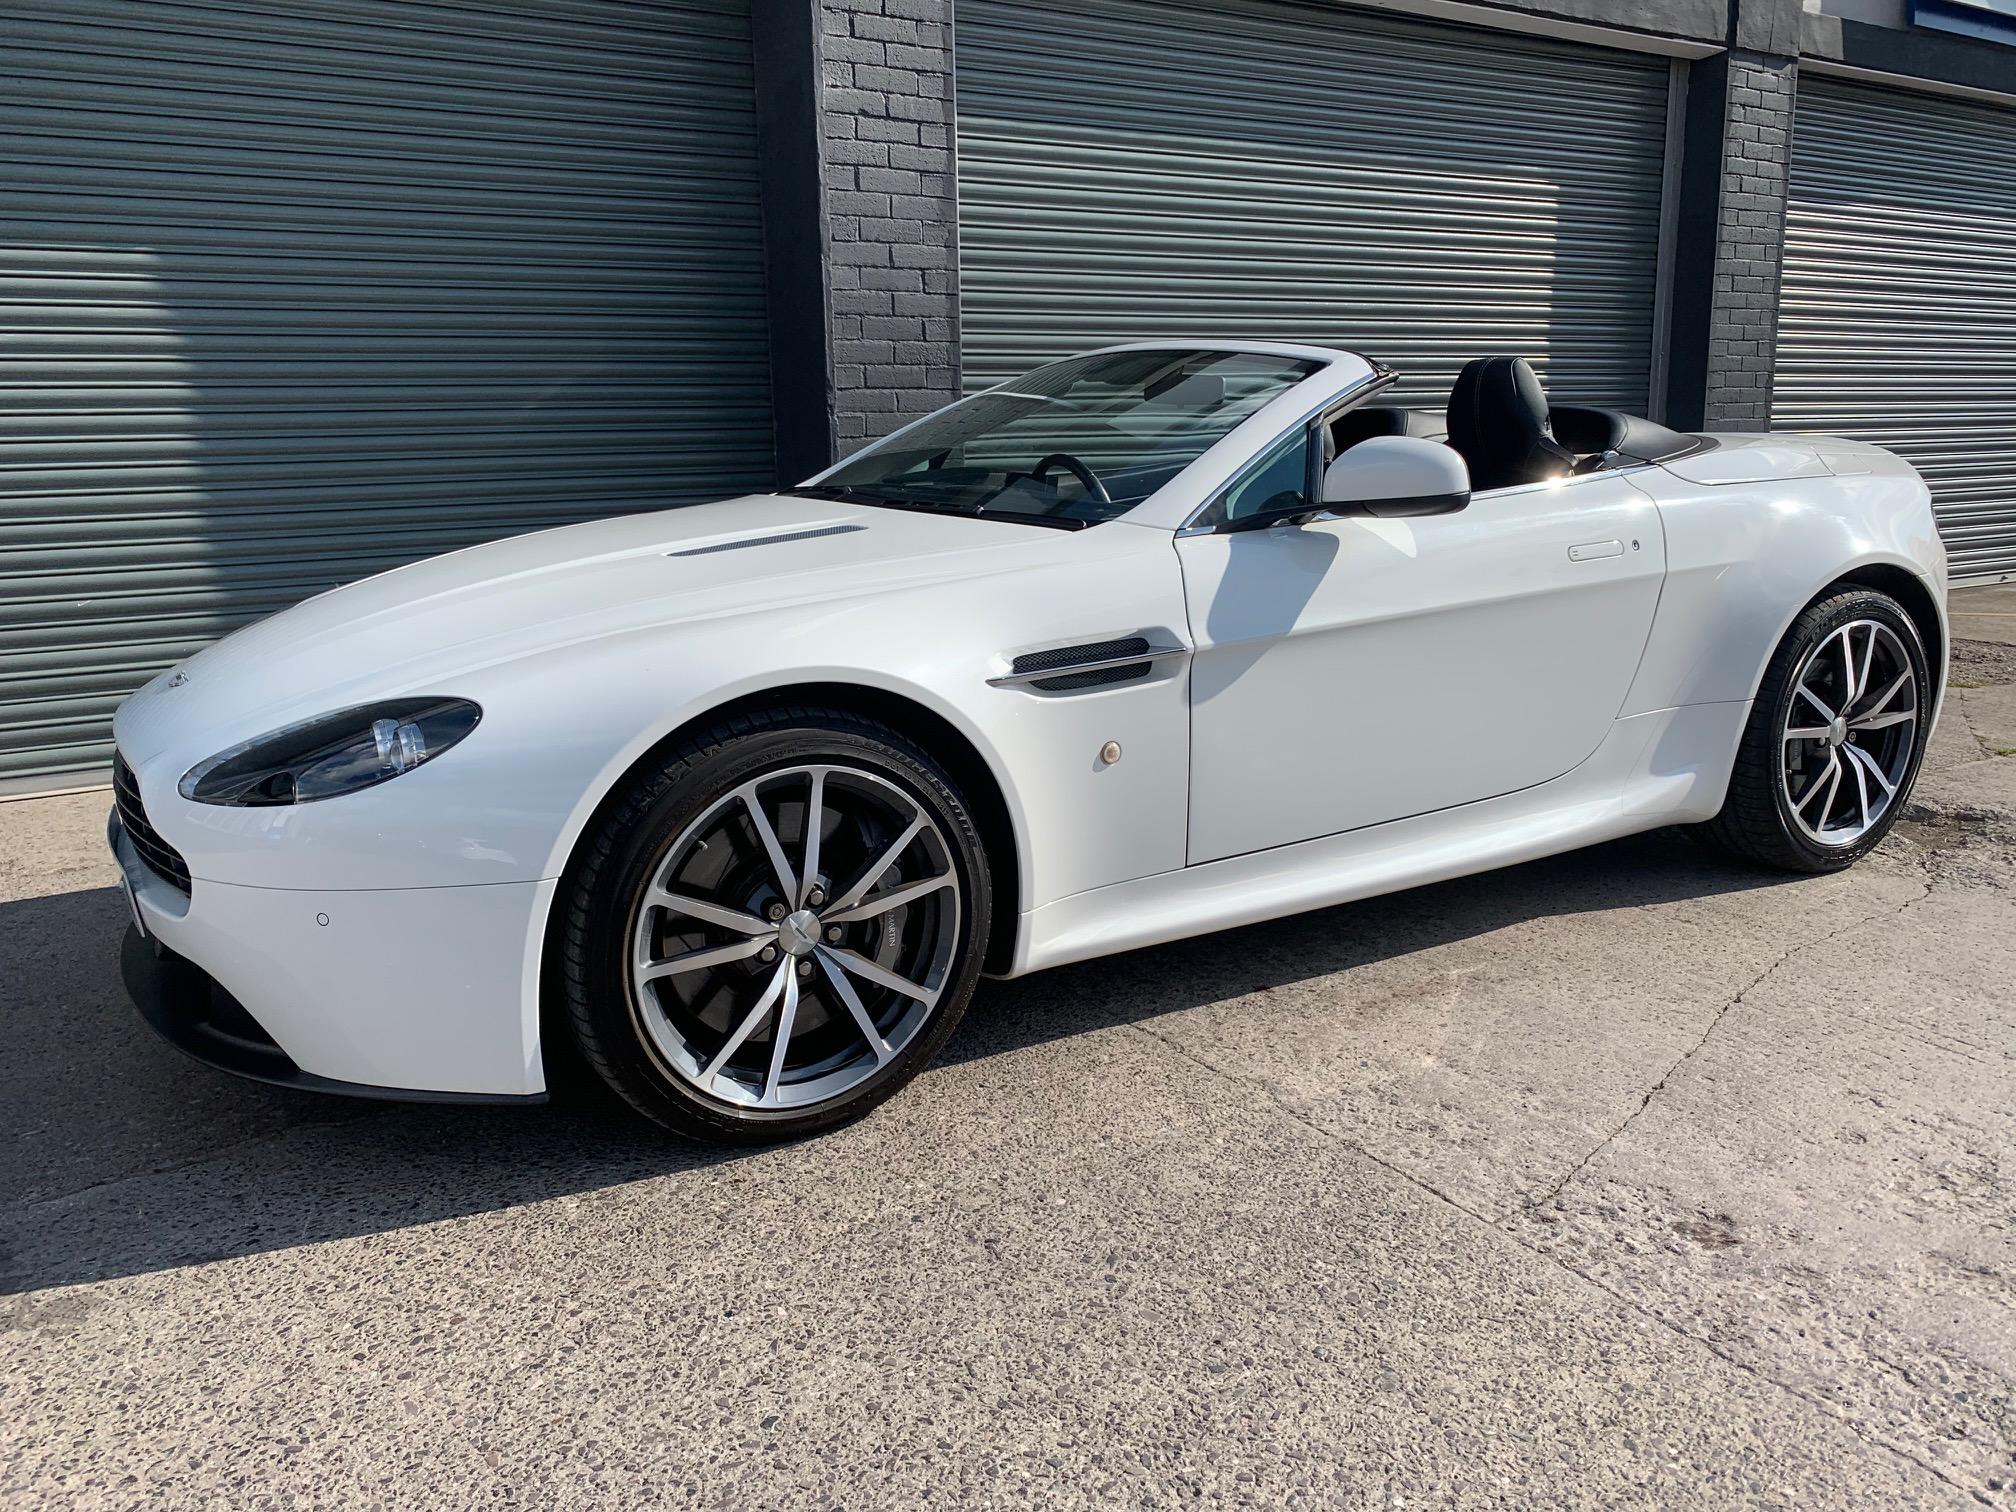 Aston Martin V8 Vantage 4 7 Roadster Sportshift Ii Lts Sports Cars